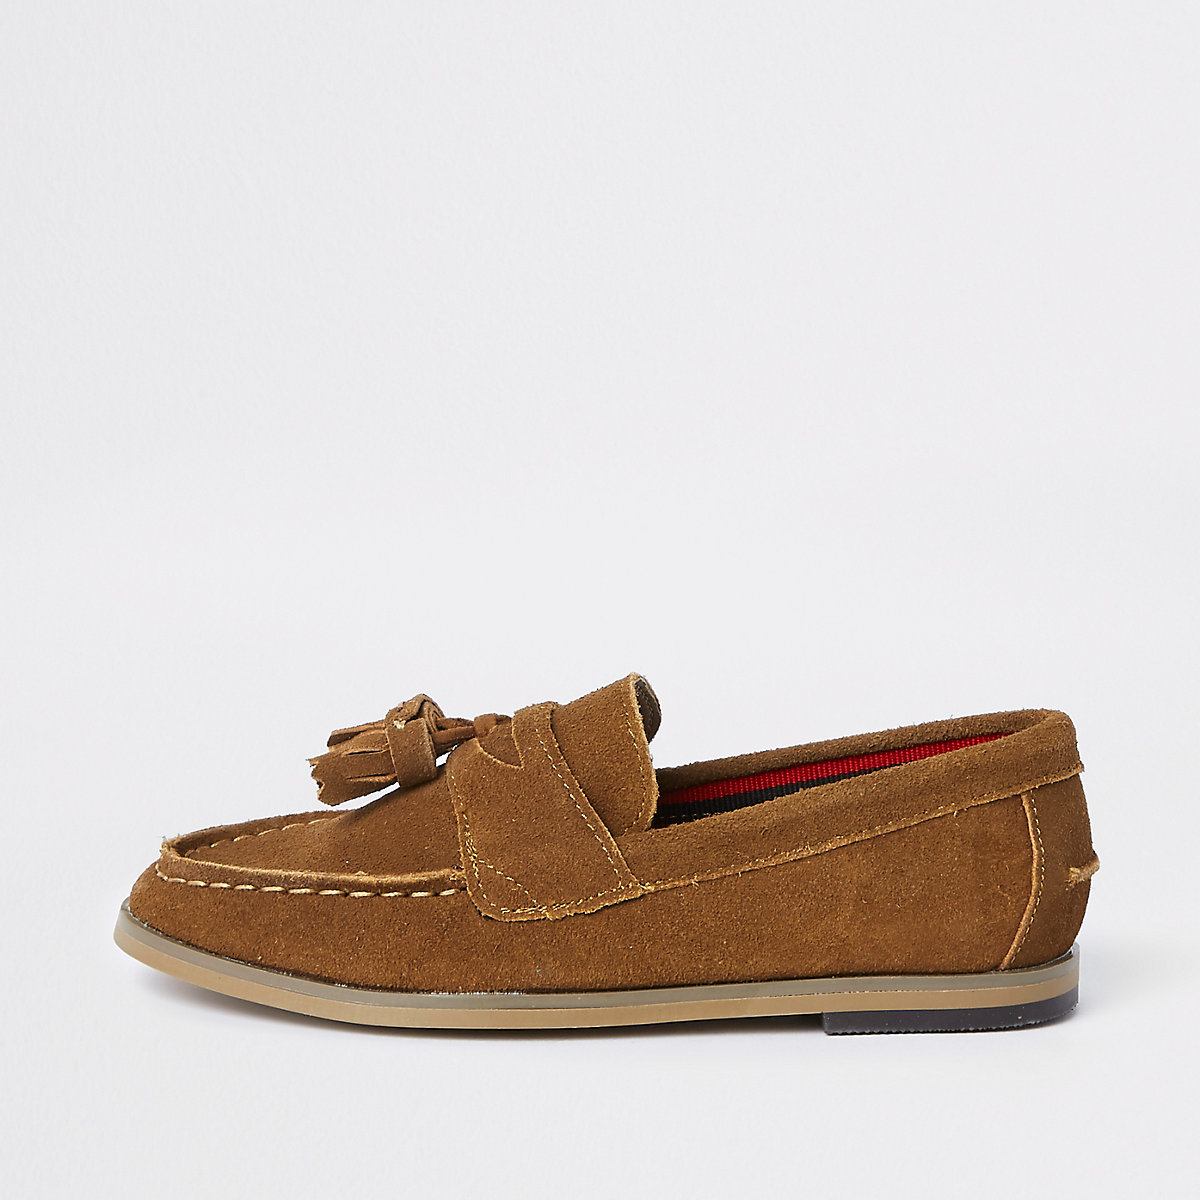 Boys brown tassel loafers